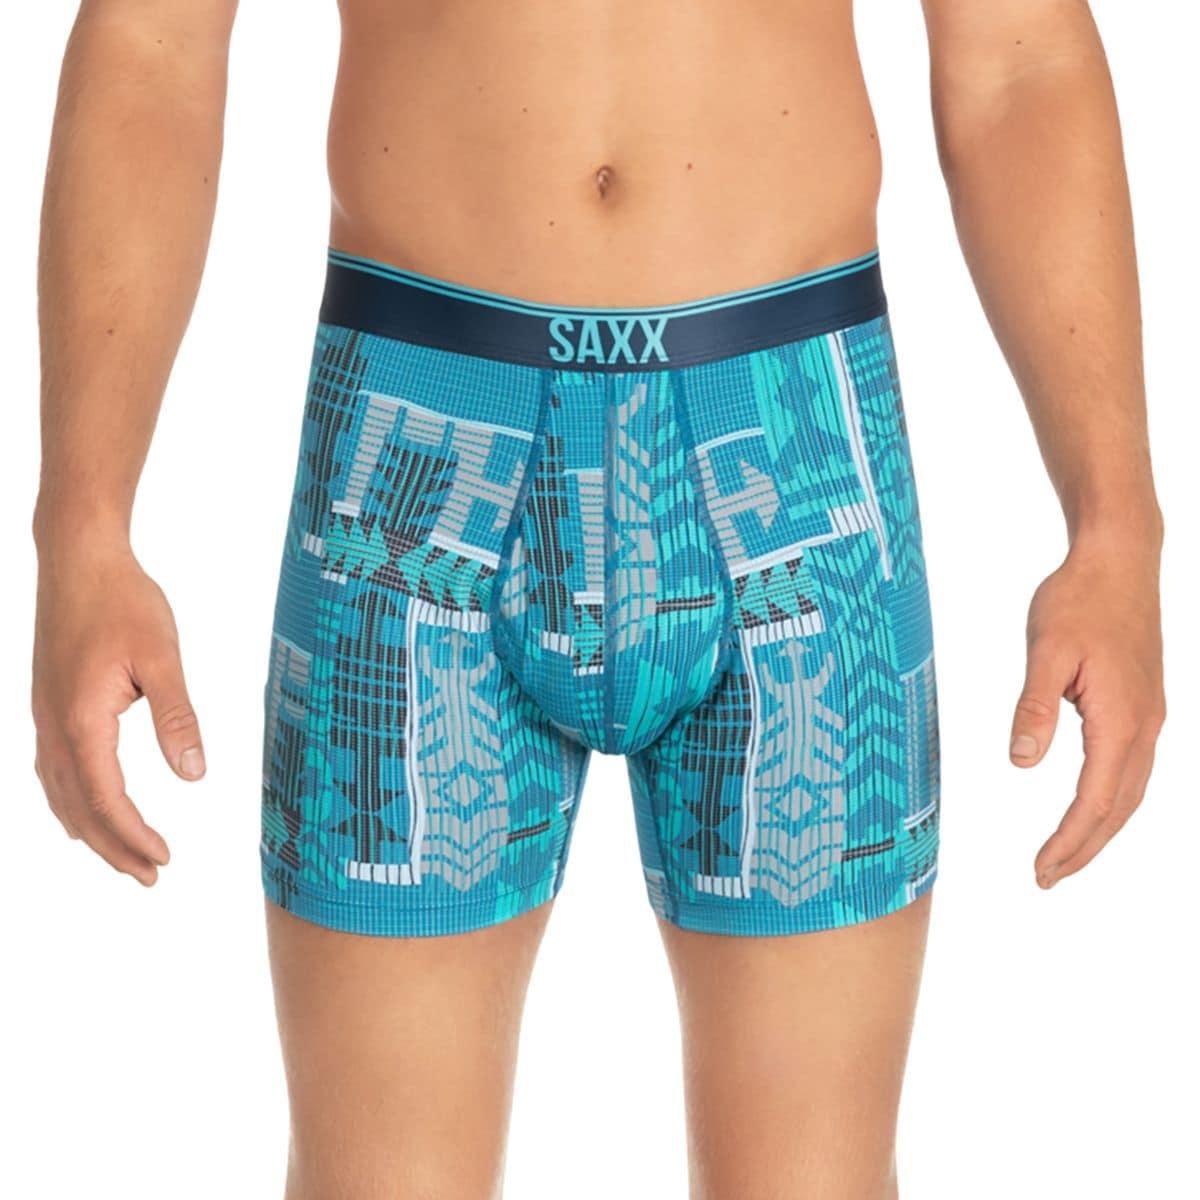 Size M L Saxx Men/'s Underwear Quest Boxer Briefs with Fly Dark Charcoal